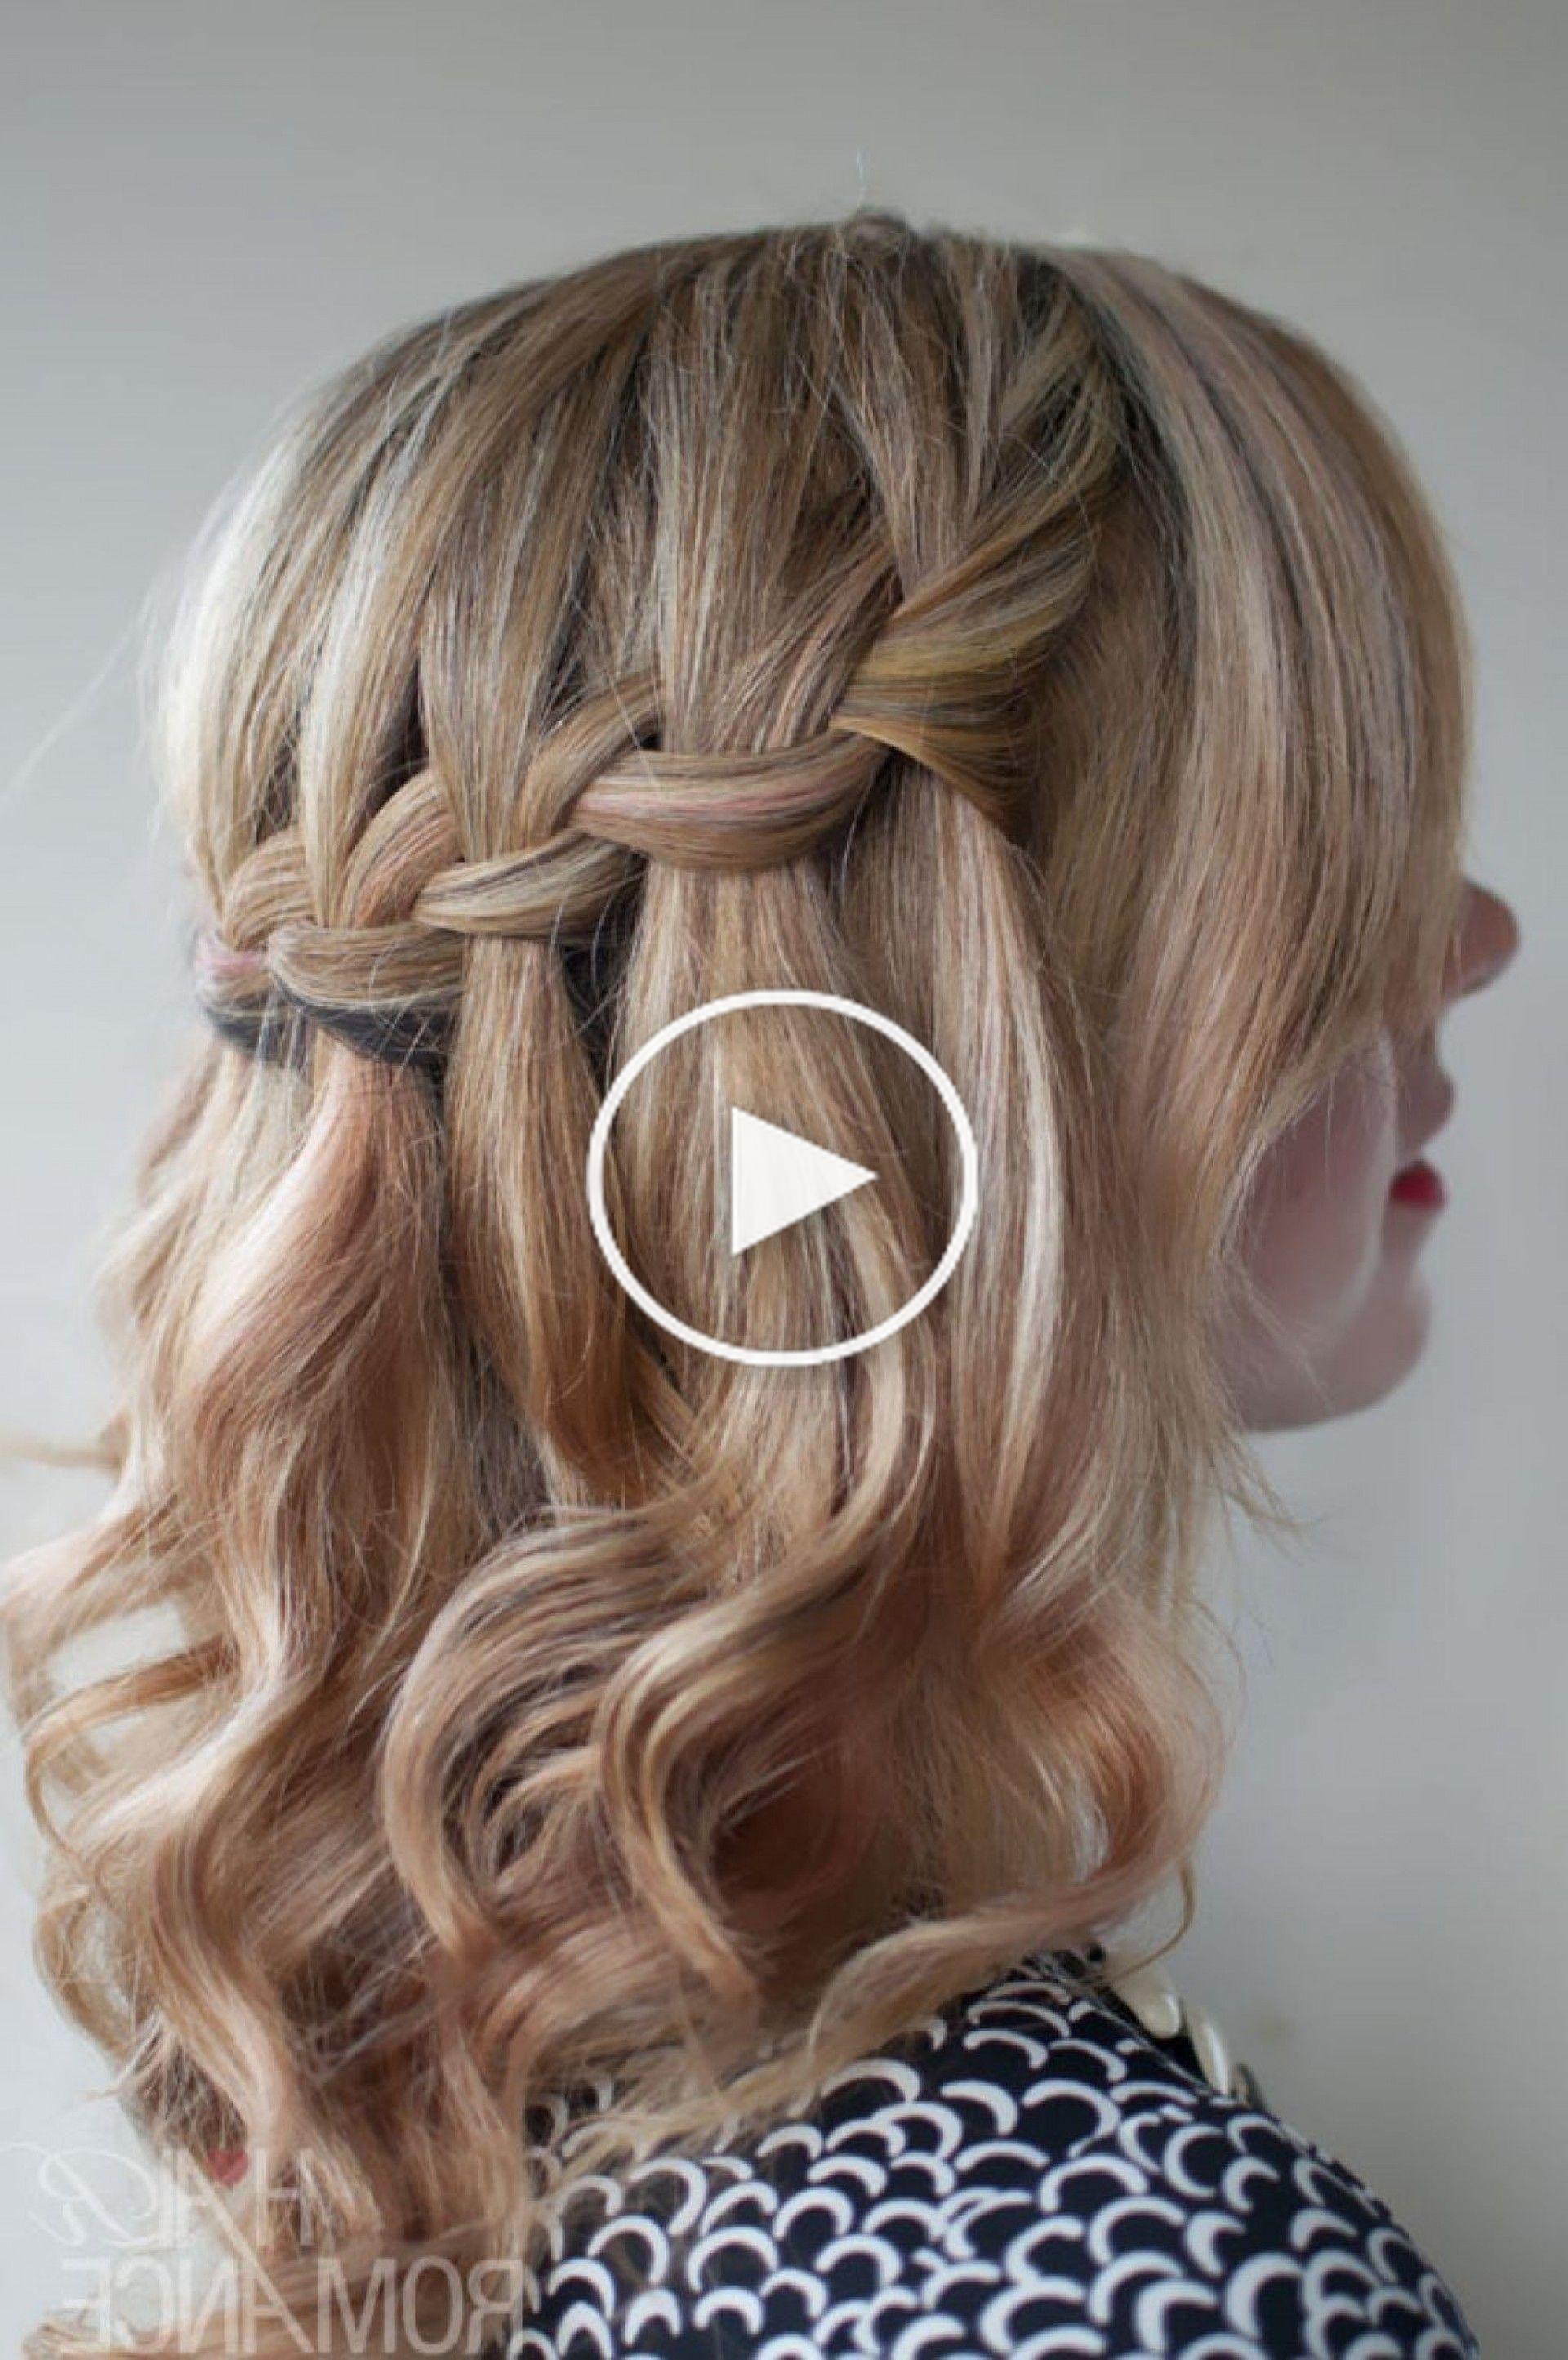 9 Graduation Hairstyles For Short Hair Unusual Grad Natural ...